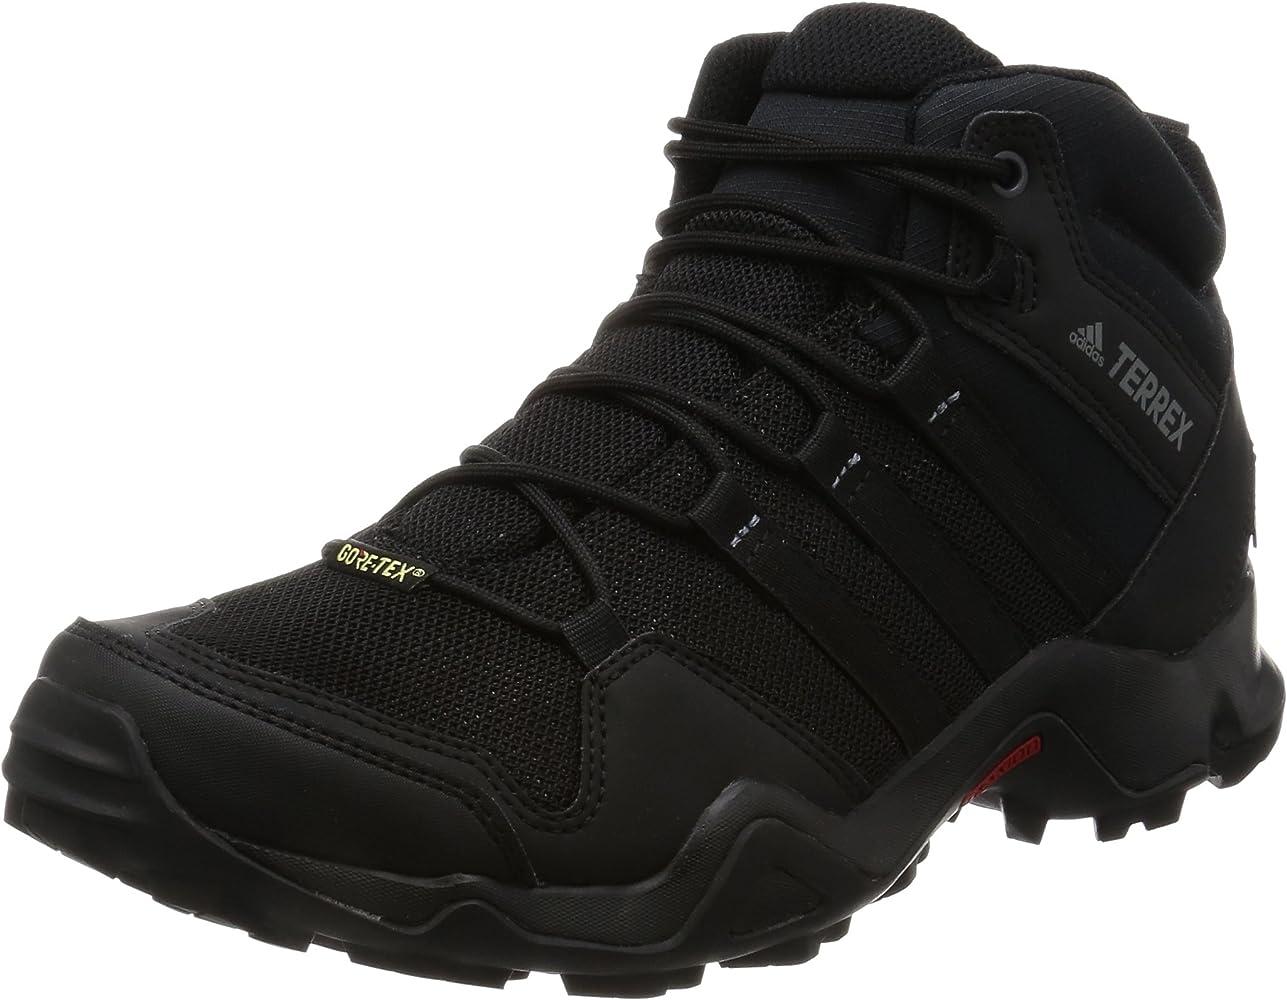 adidas Terrex Ax2r GTX, Zapatillas de Senderismo para Hombre